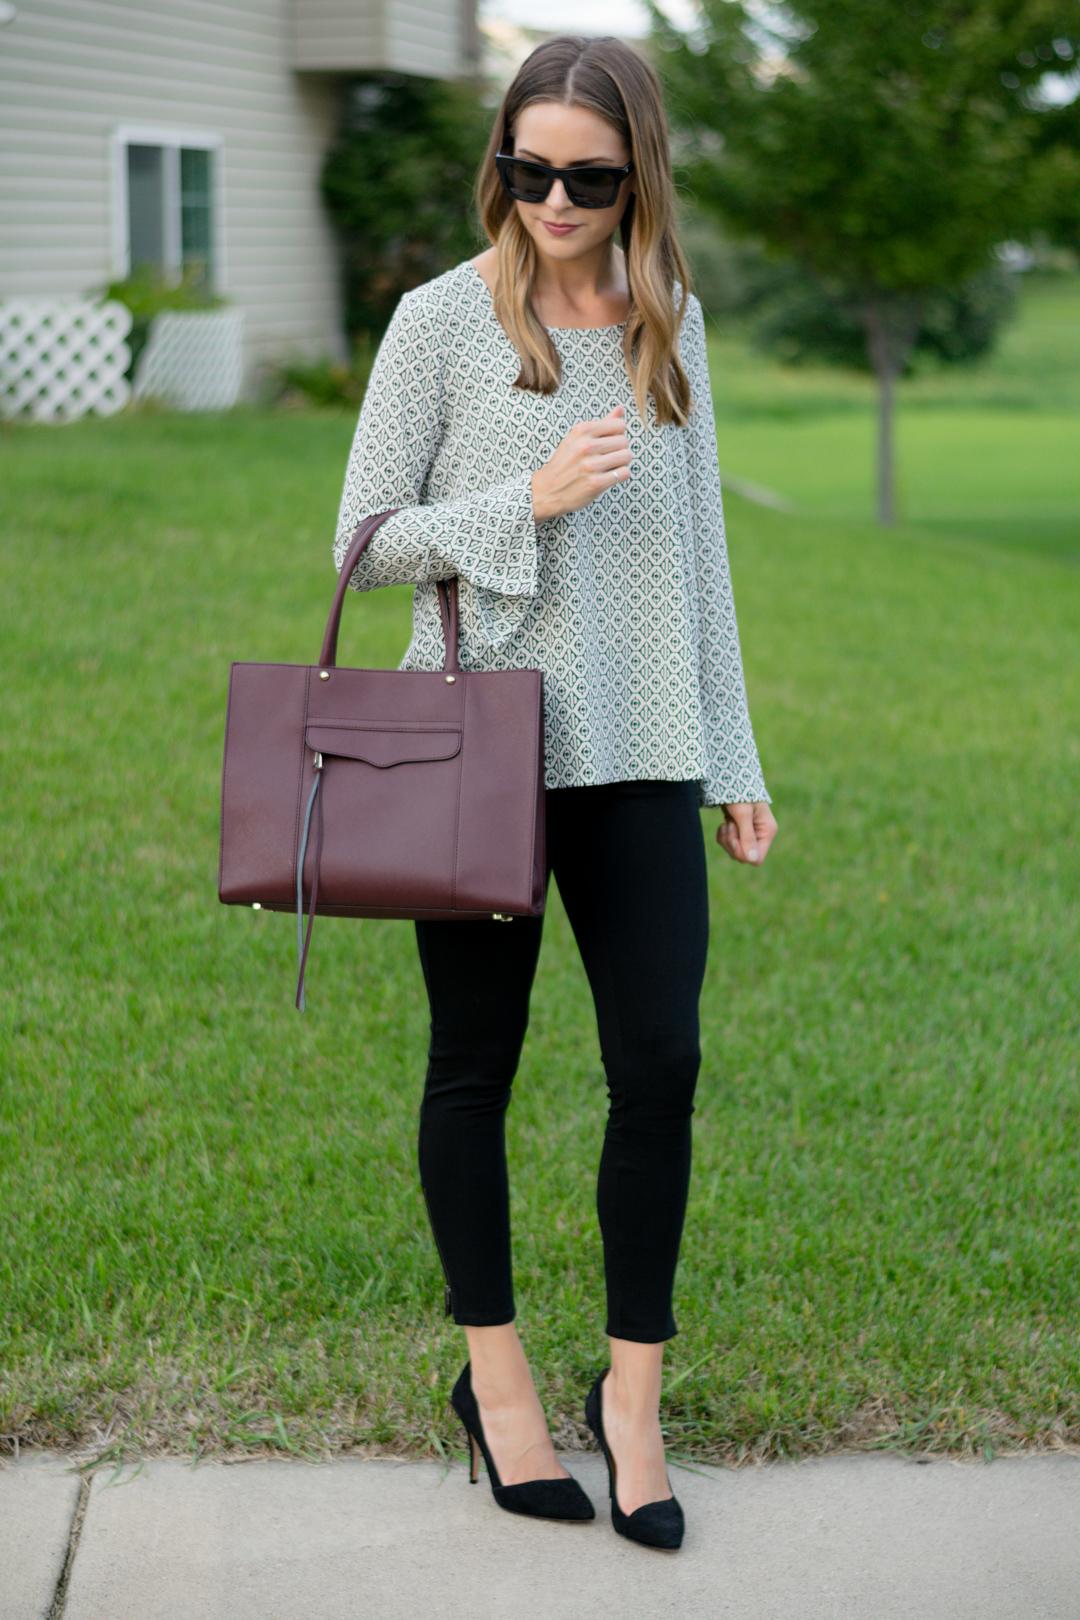 Pleione bell cuff high-low blouse